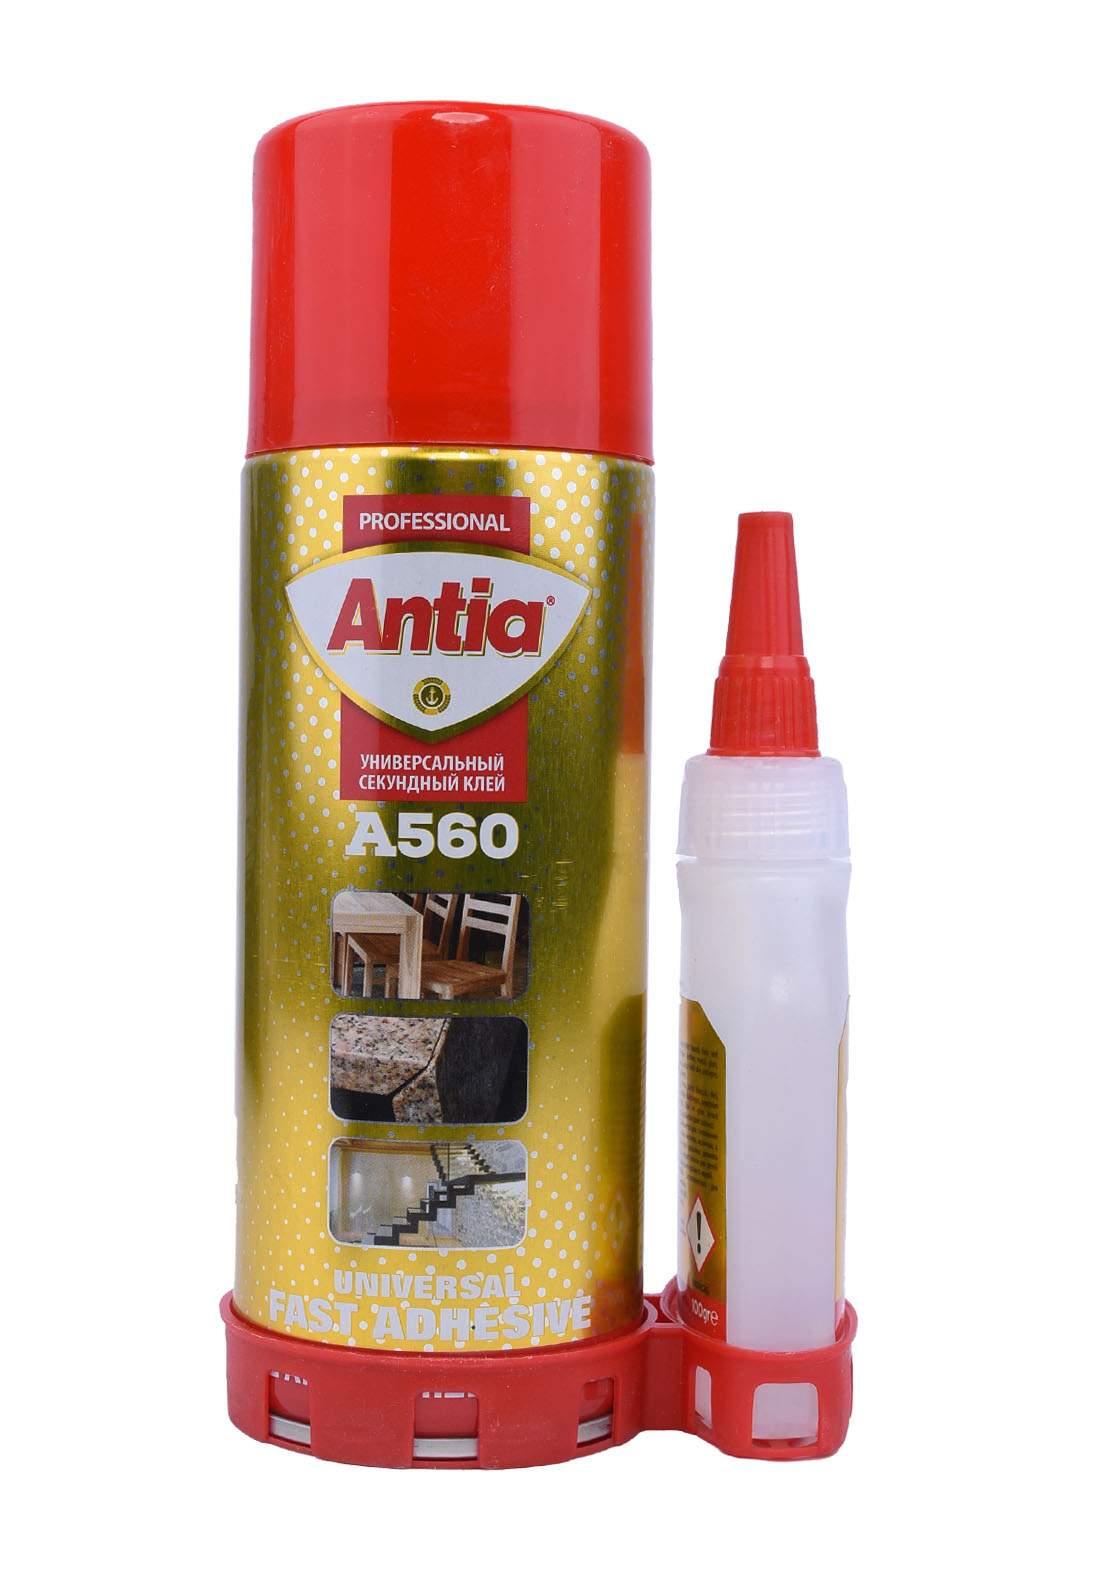 Antia An-E7003 Universal Fast Adhesive Mdf A560 400ml لاصق سريع